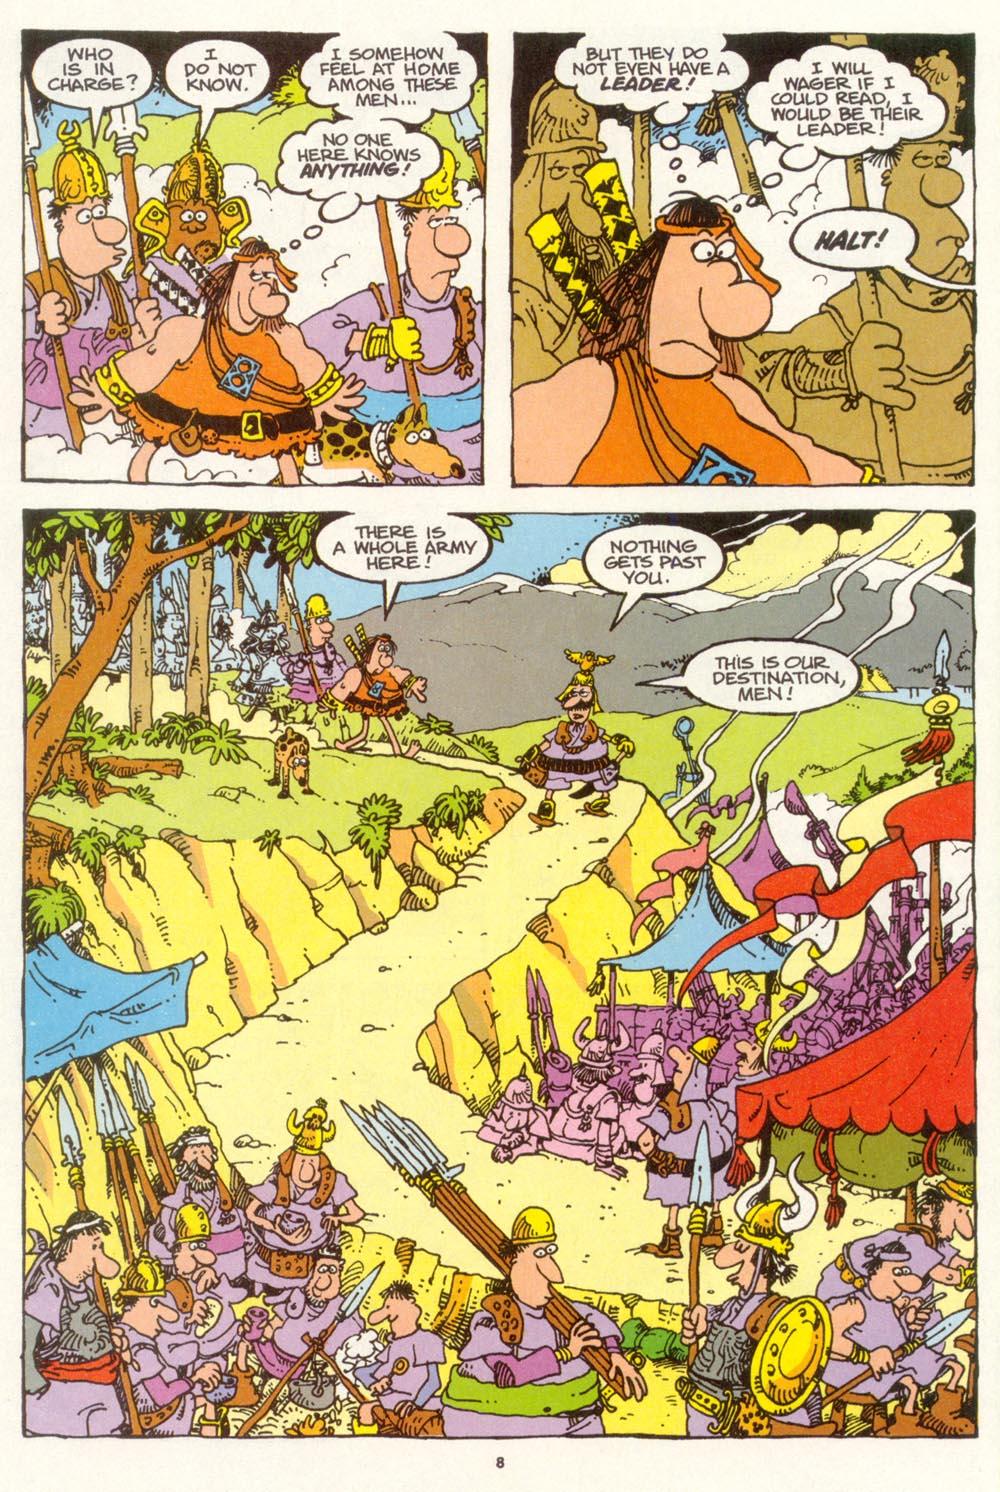 Read online Sergio Aragonés Groo the Wanderer comic -  Issue #100 - 9